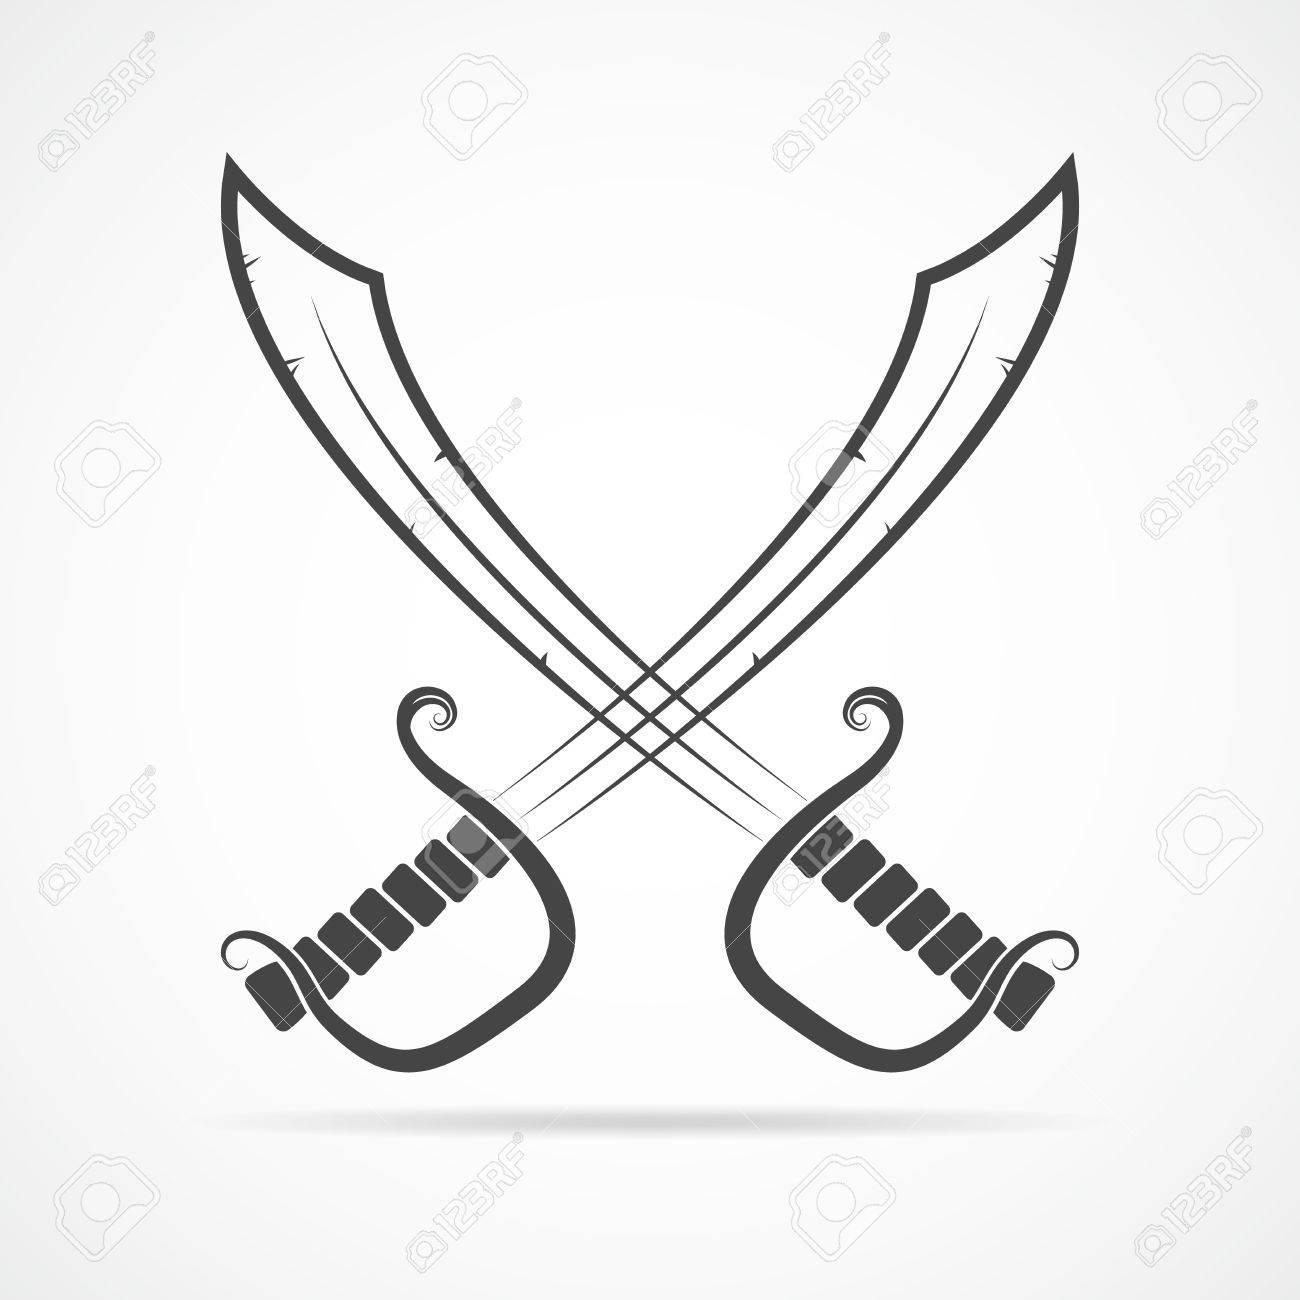 1300x1300 Two Crossed Swords In Flat Design. Simple Black Sword Icon